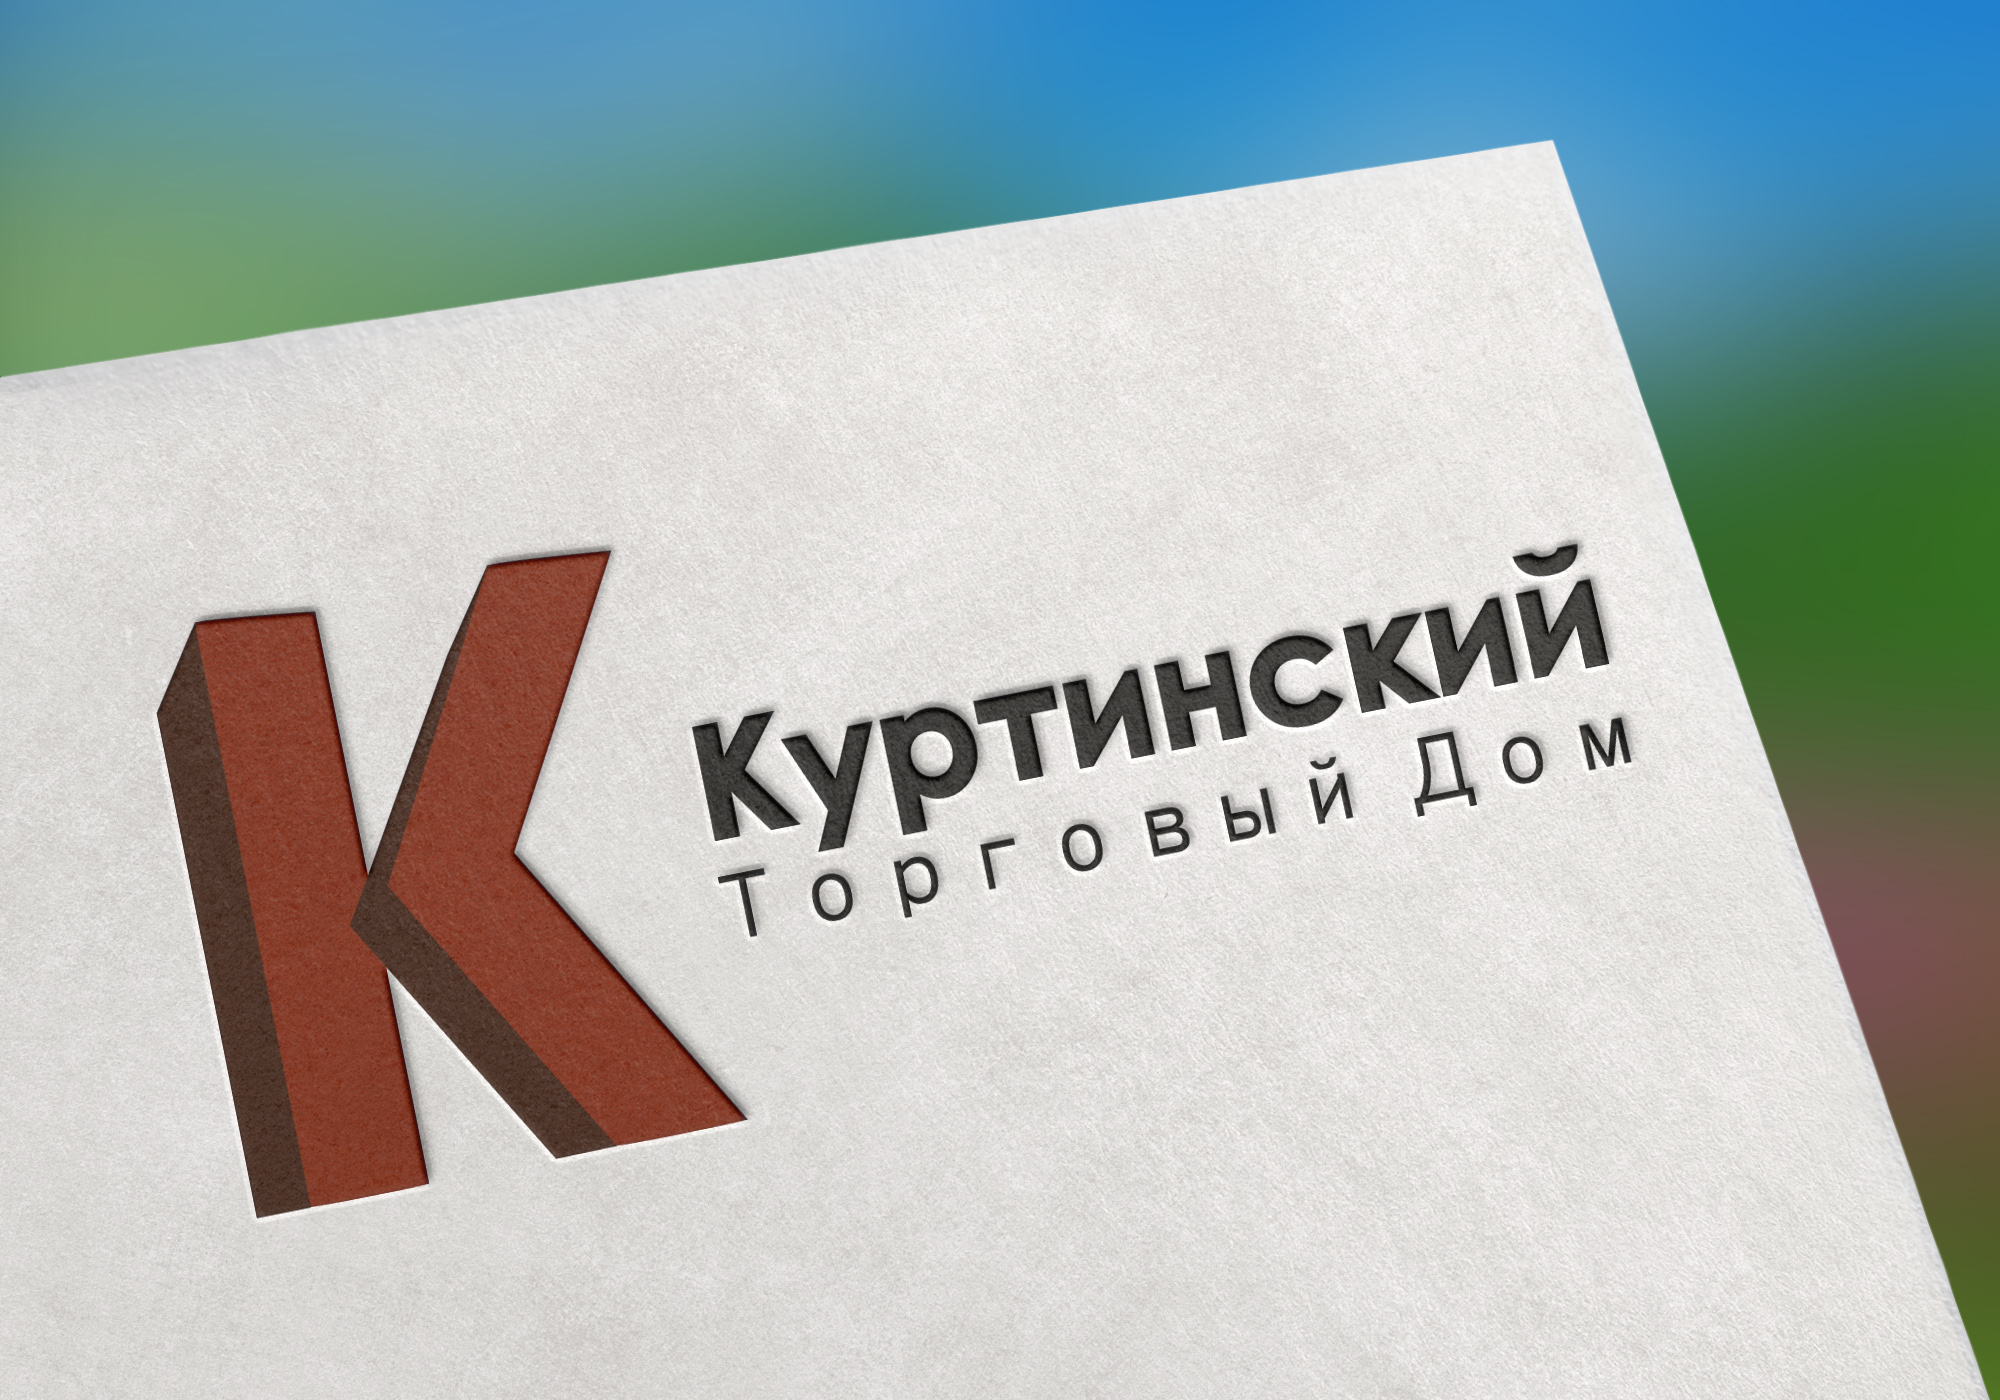 Логотип для камнедобывающей компании фото f_8865b9e0b648aeb0.jpg